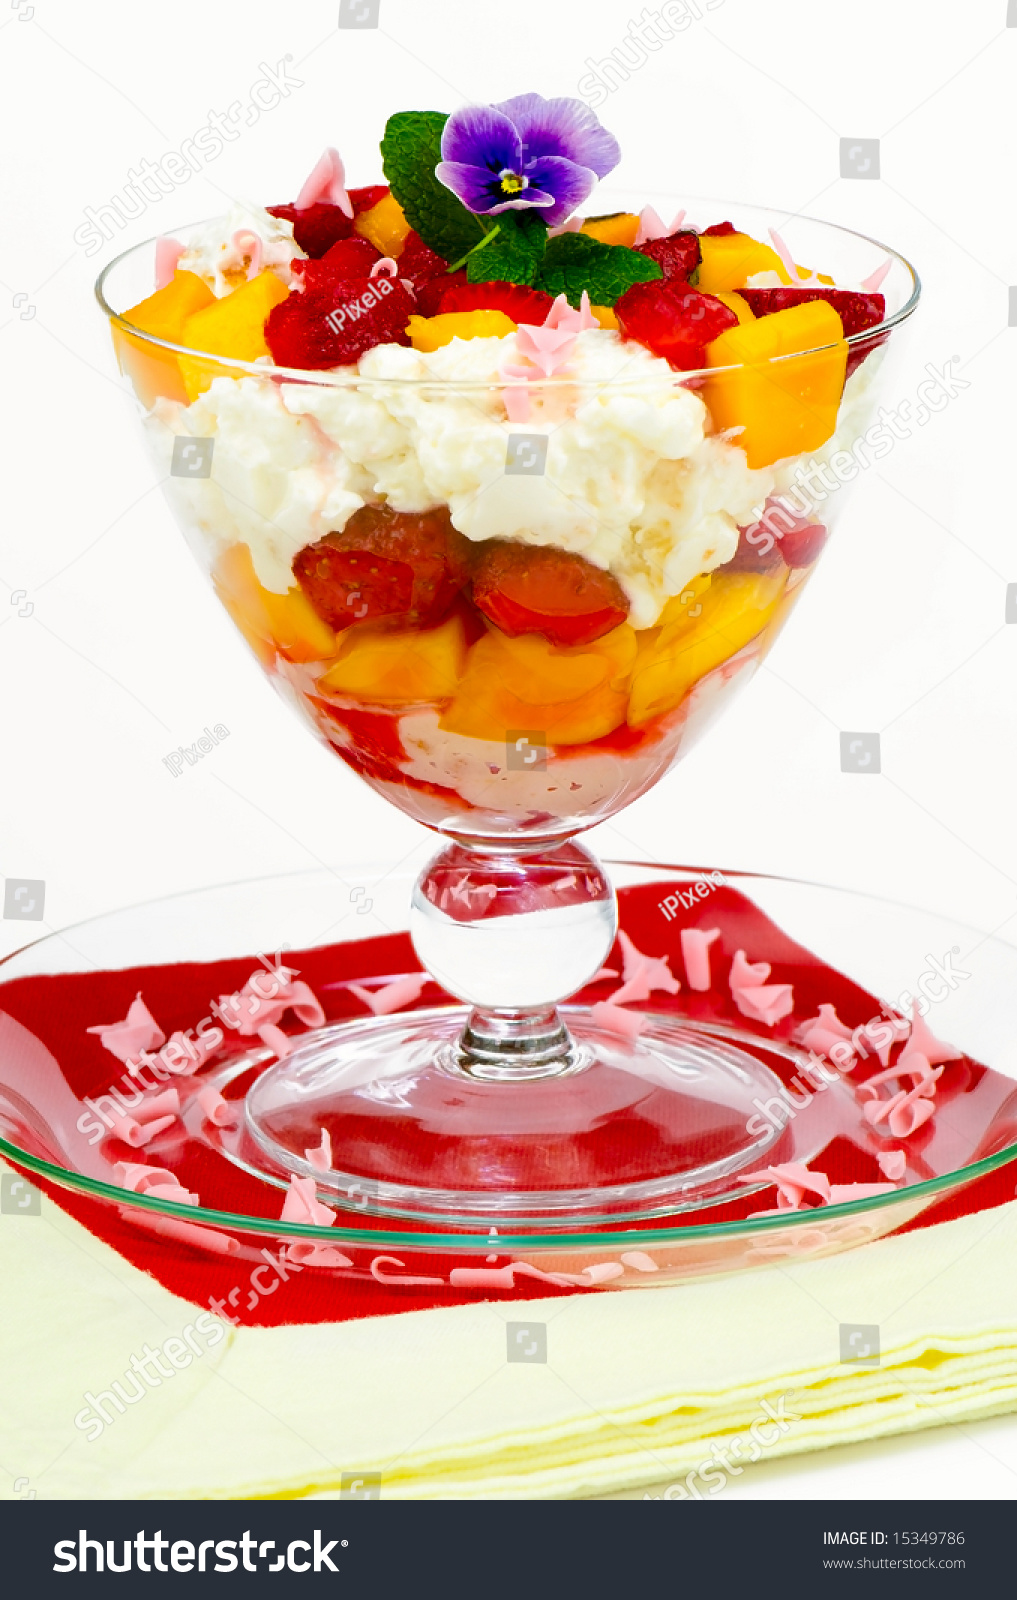 Strawberry And Mango Trifle Dessert Stock Photo 15349786 : Shutterstock